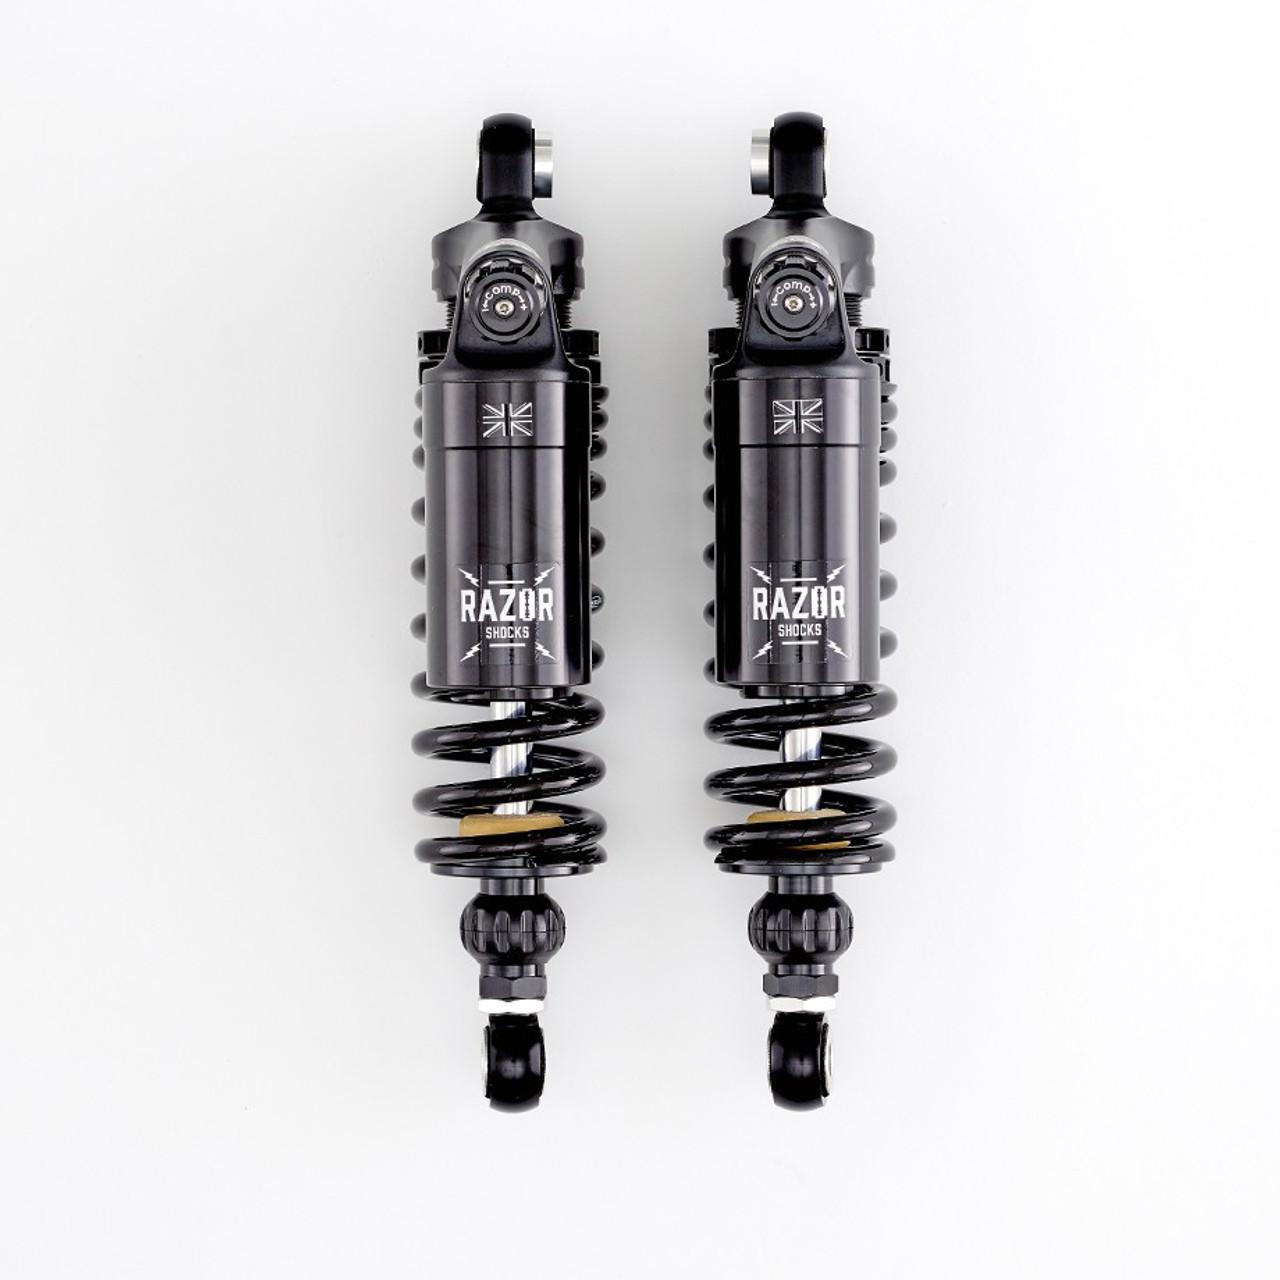 K-Tech Razor IV Piggyback Triumph Bonneville 16-17 Street Twin, T100, T120 345mm +10mm 294B-250-345-STW